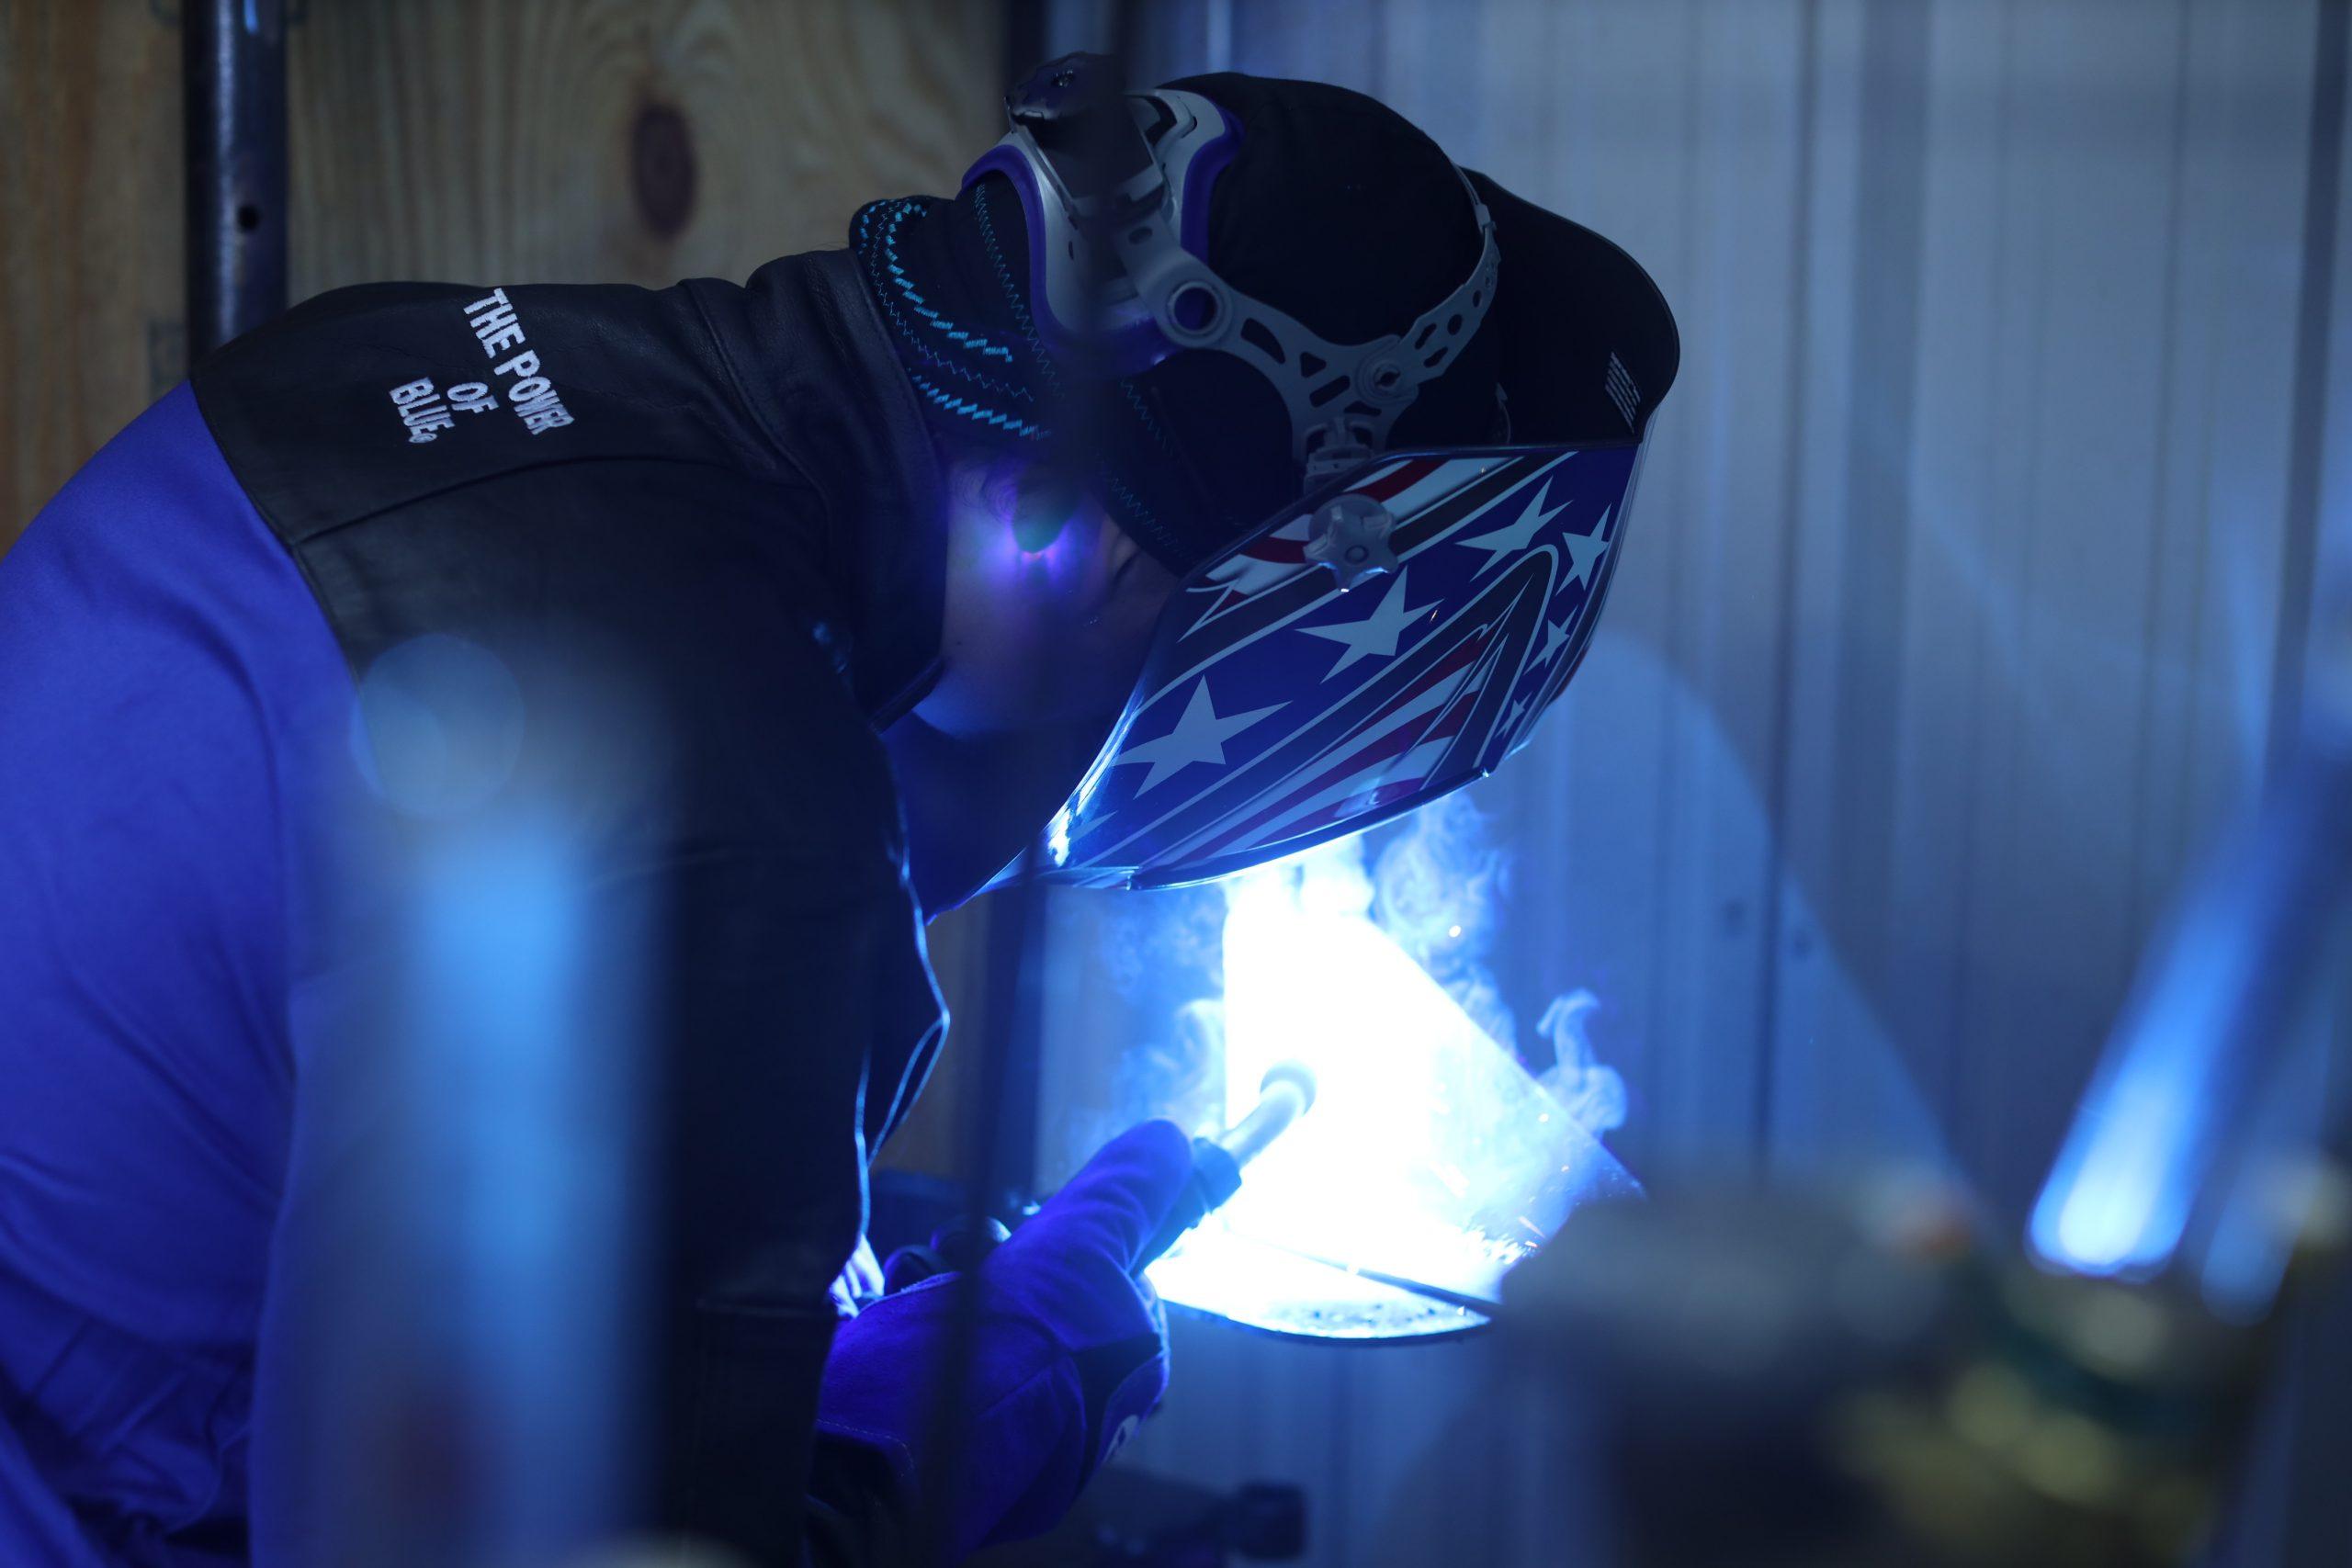 Welder welding with a stars and stripes helmet, Miller welding jacket